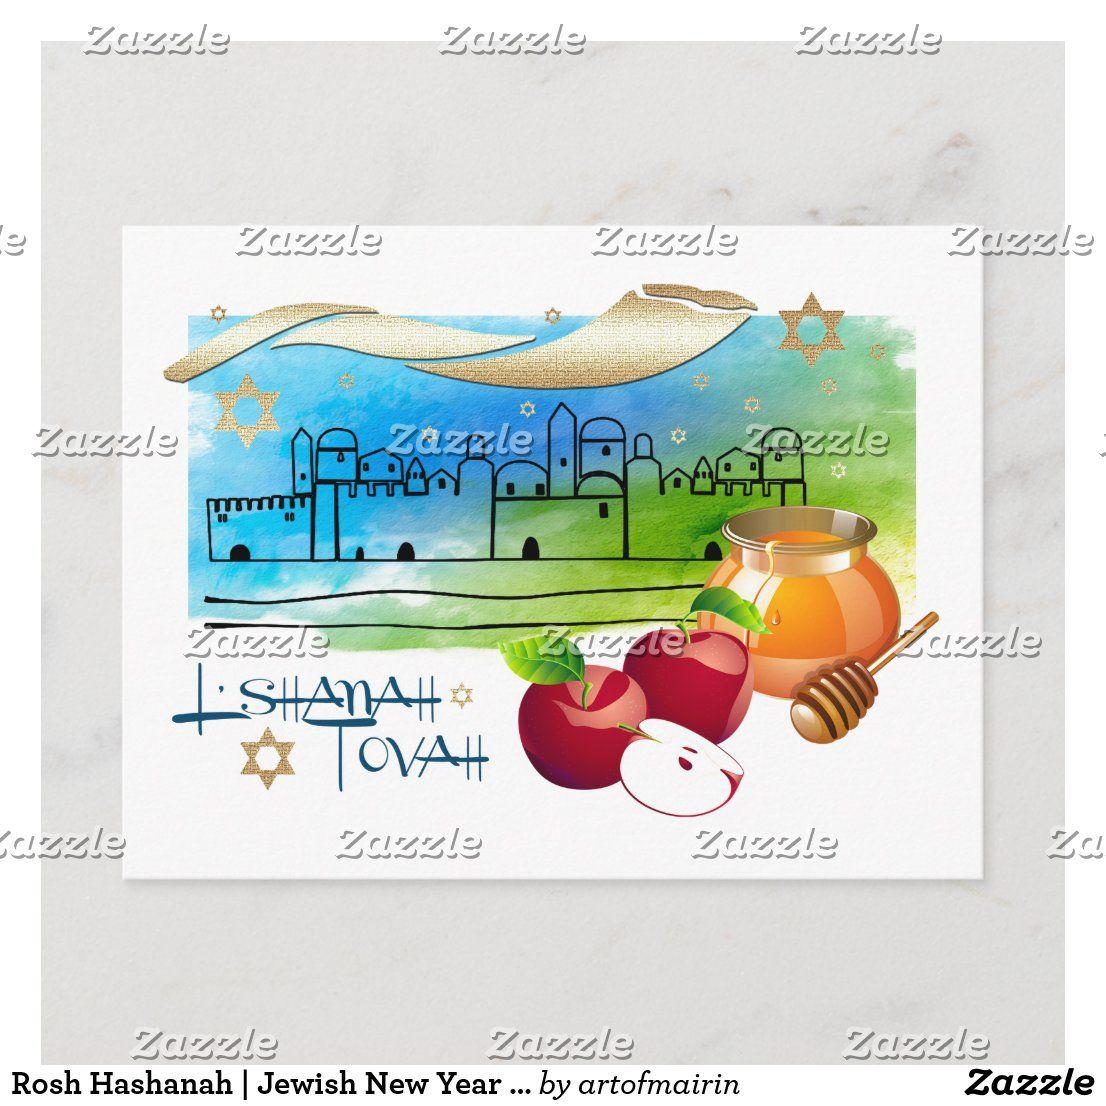 Rosh Hashanah Jewish New Year Postcards in